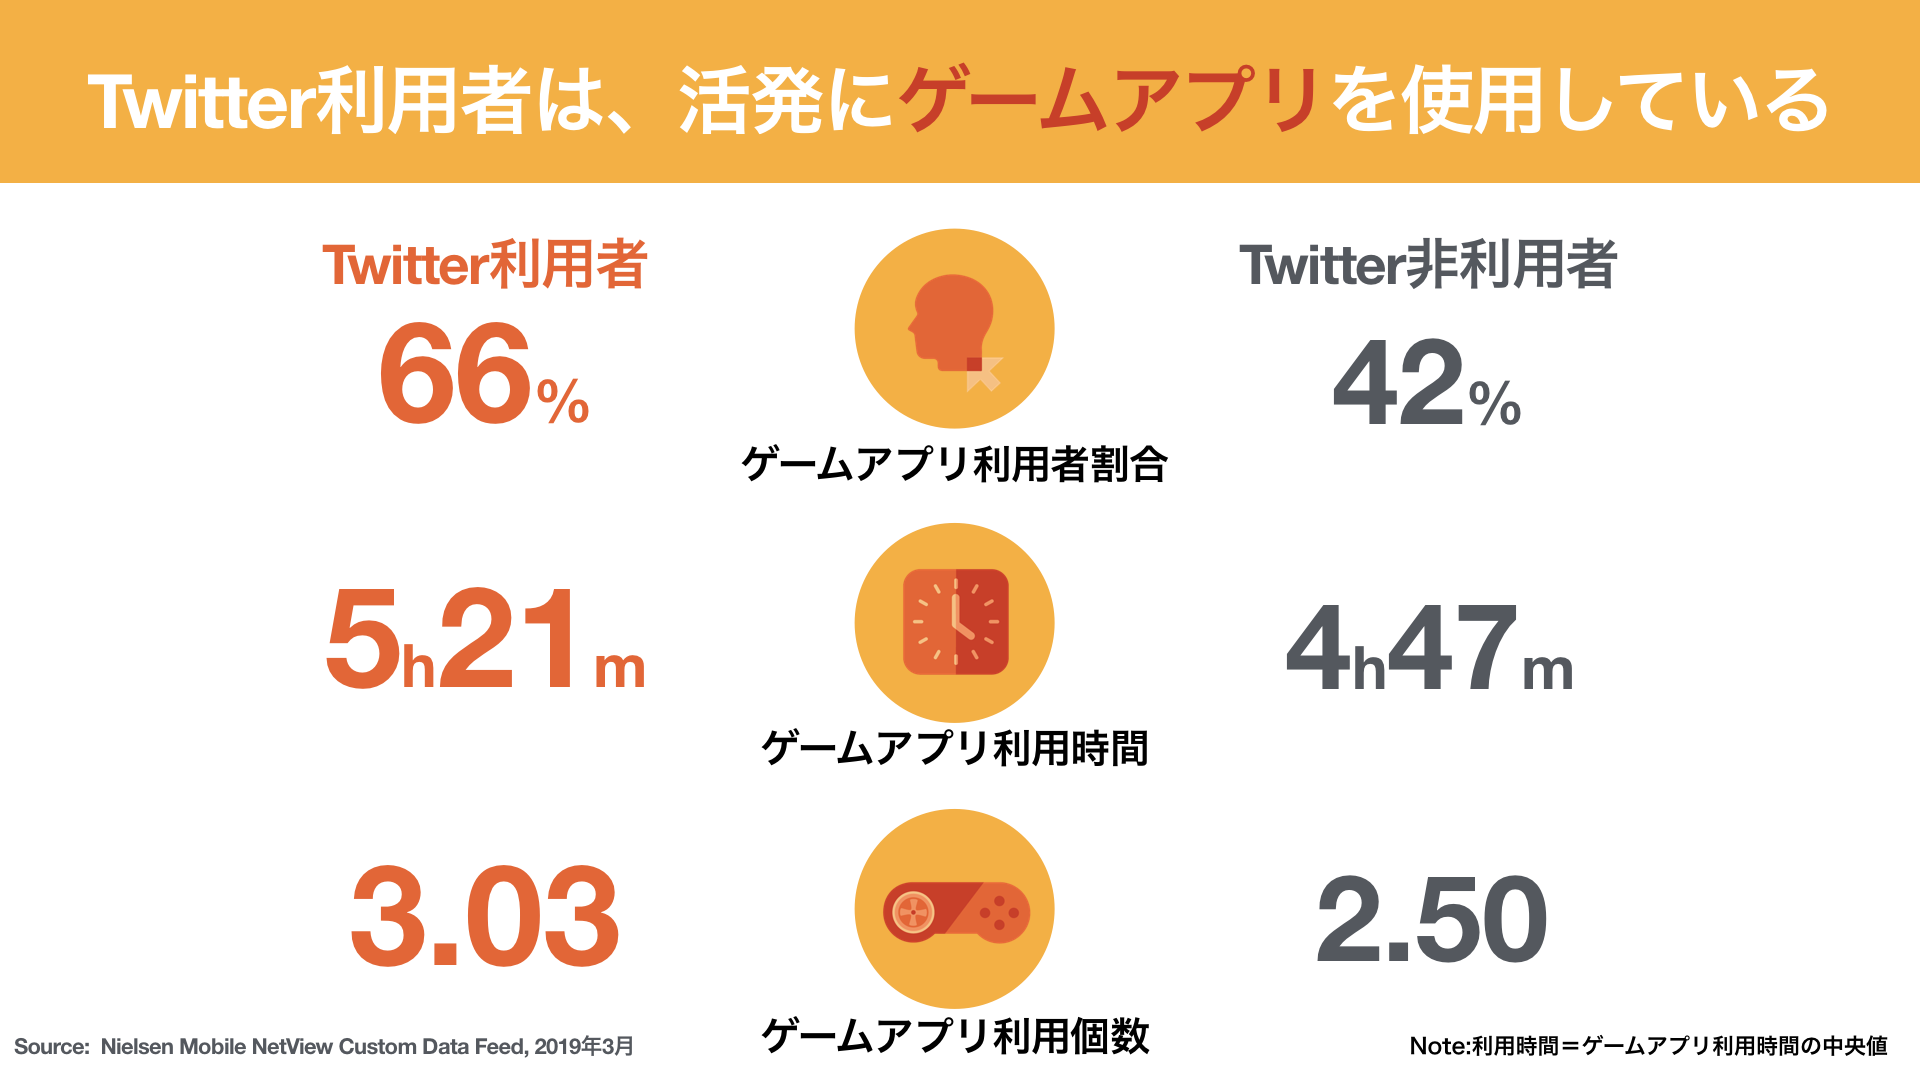 Twitter利用者は、活発にゲームアプリを使用している